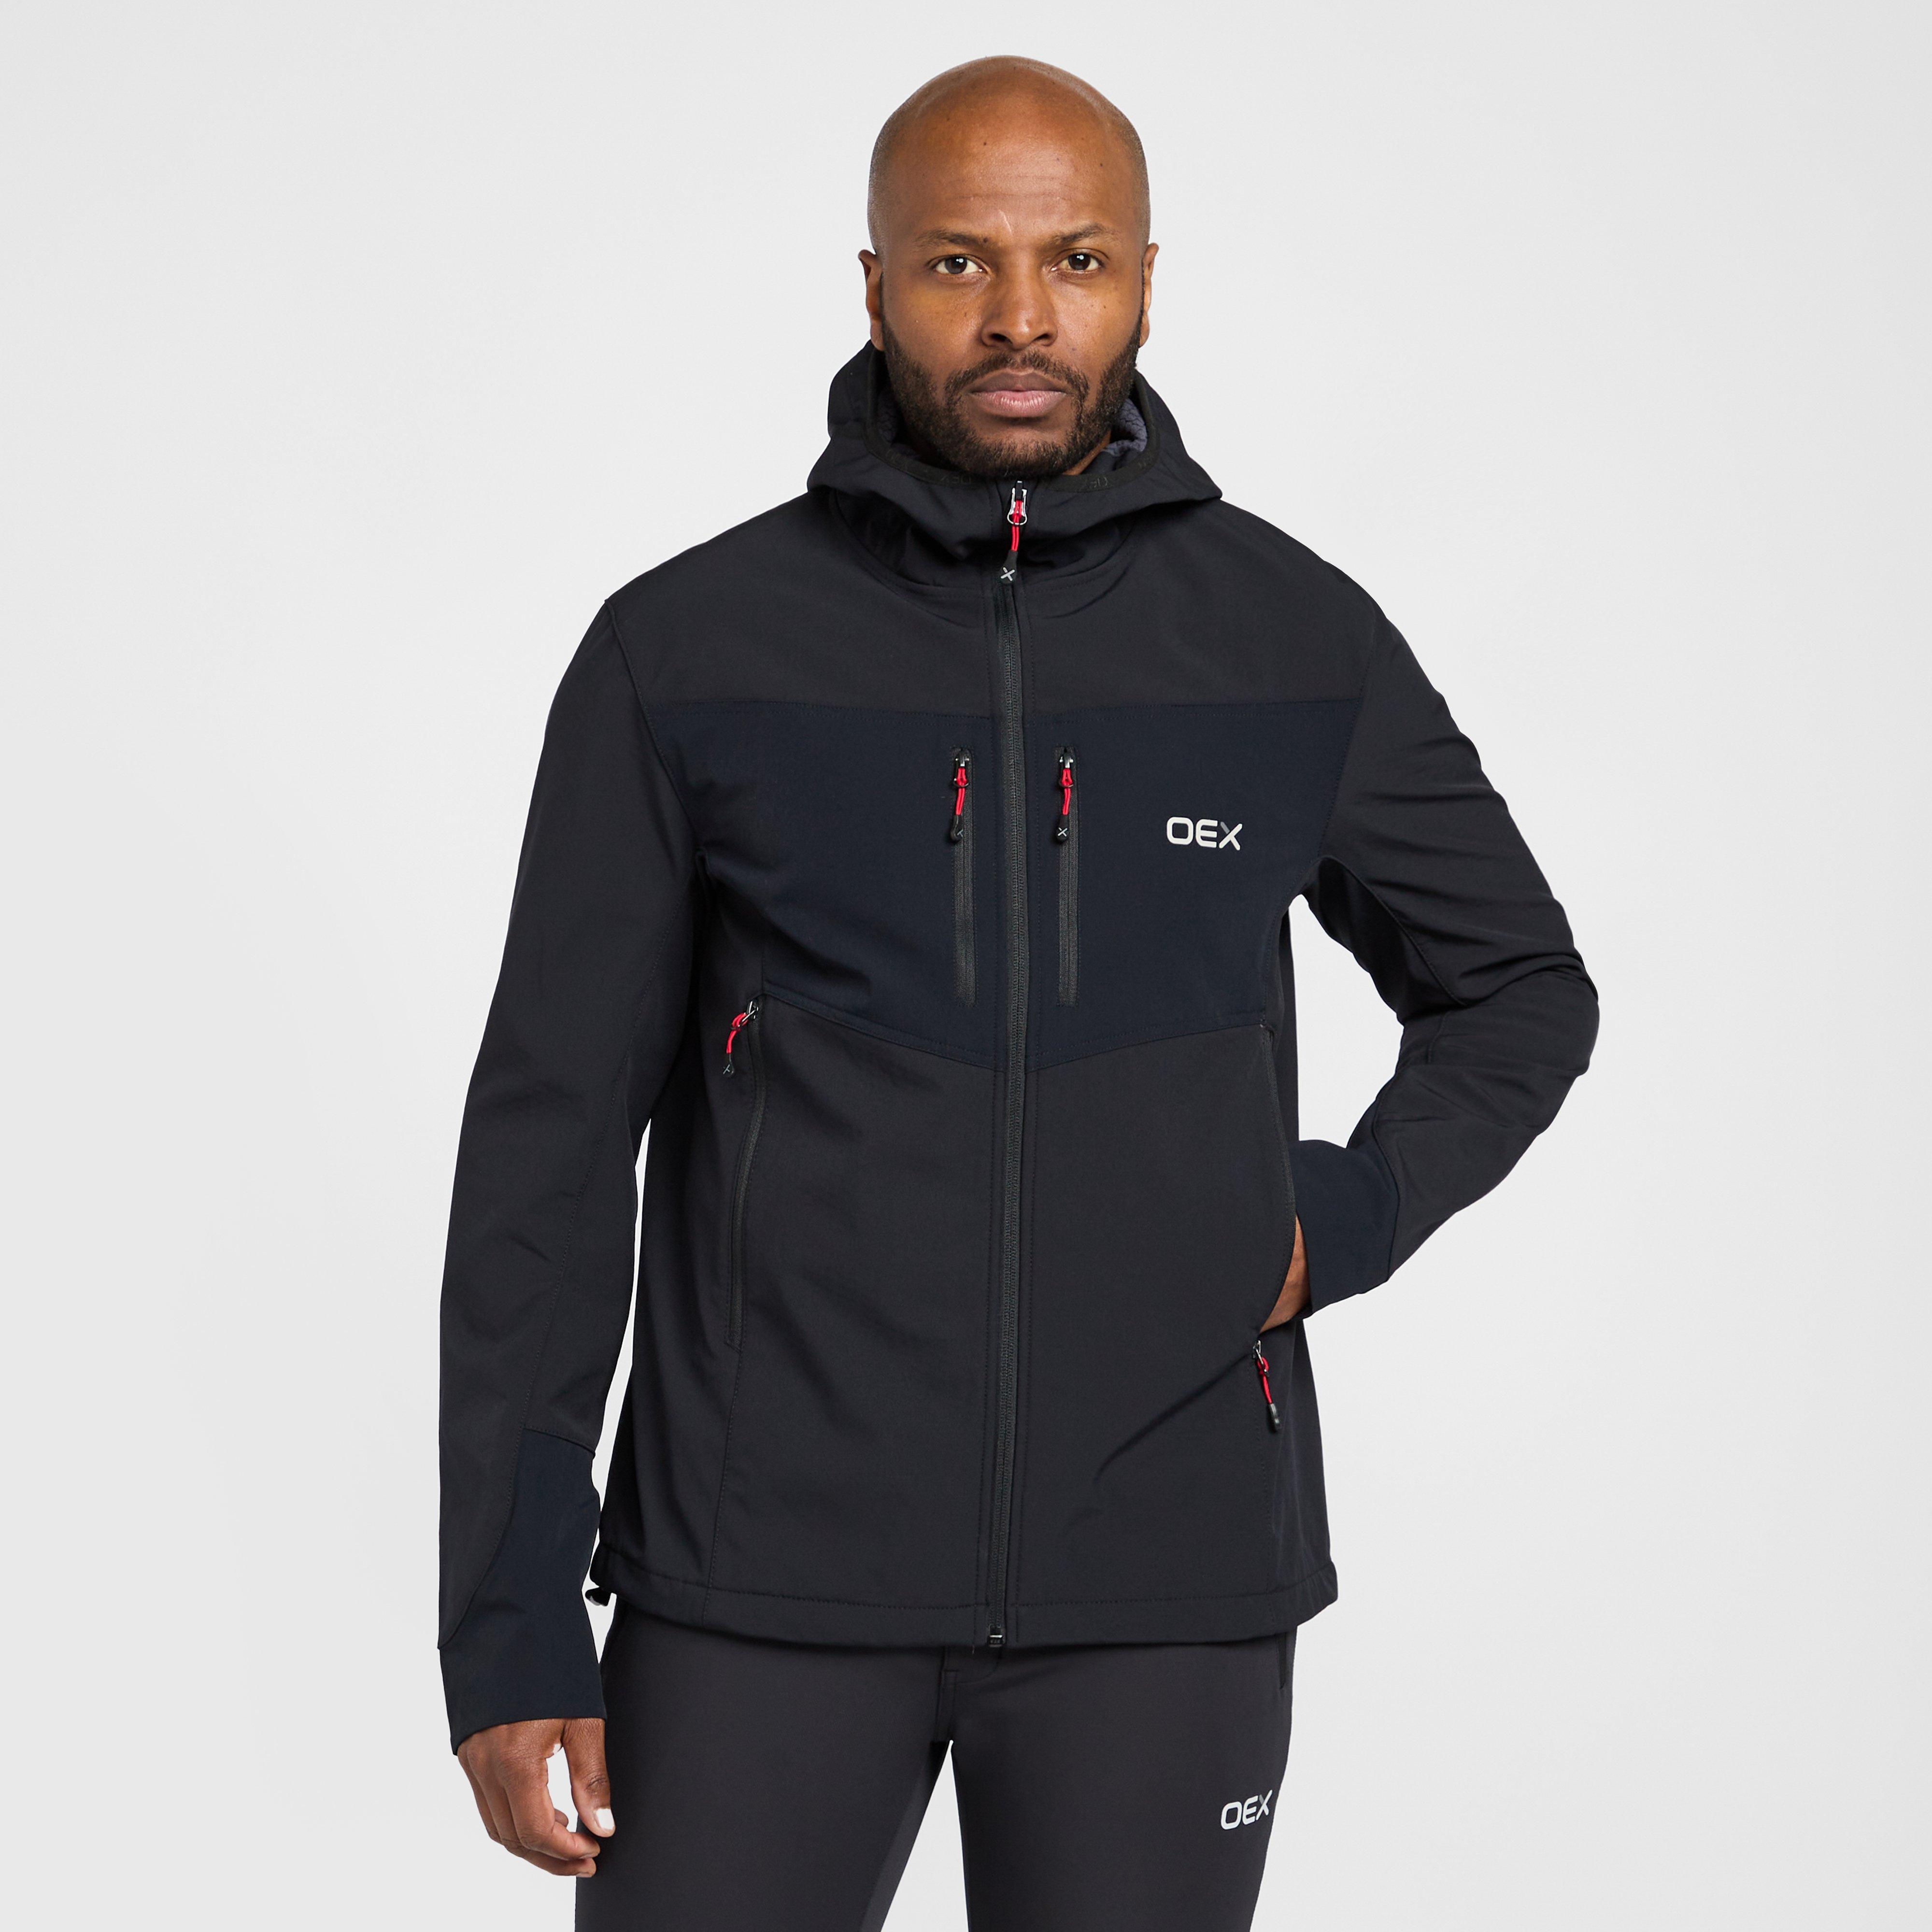 New Oex Men's Stratosphere Softshell Jacket